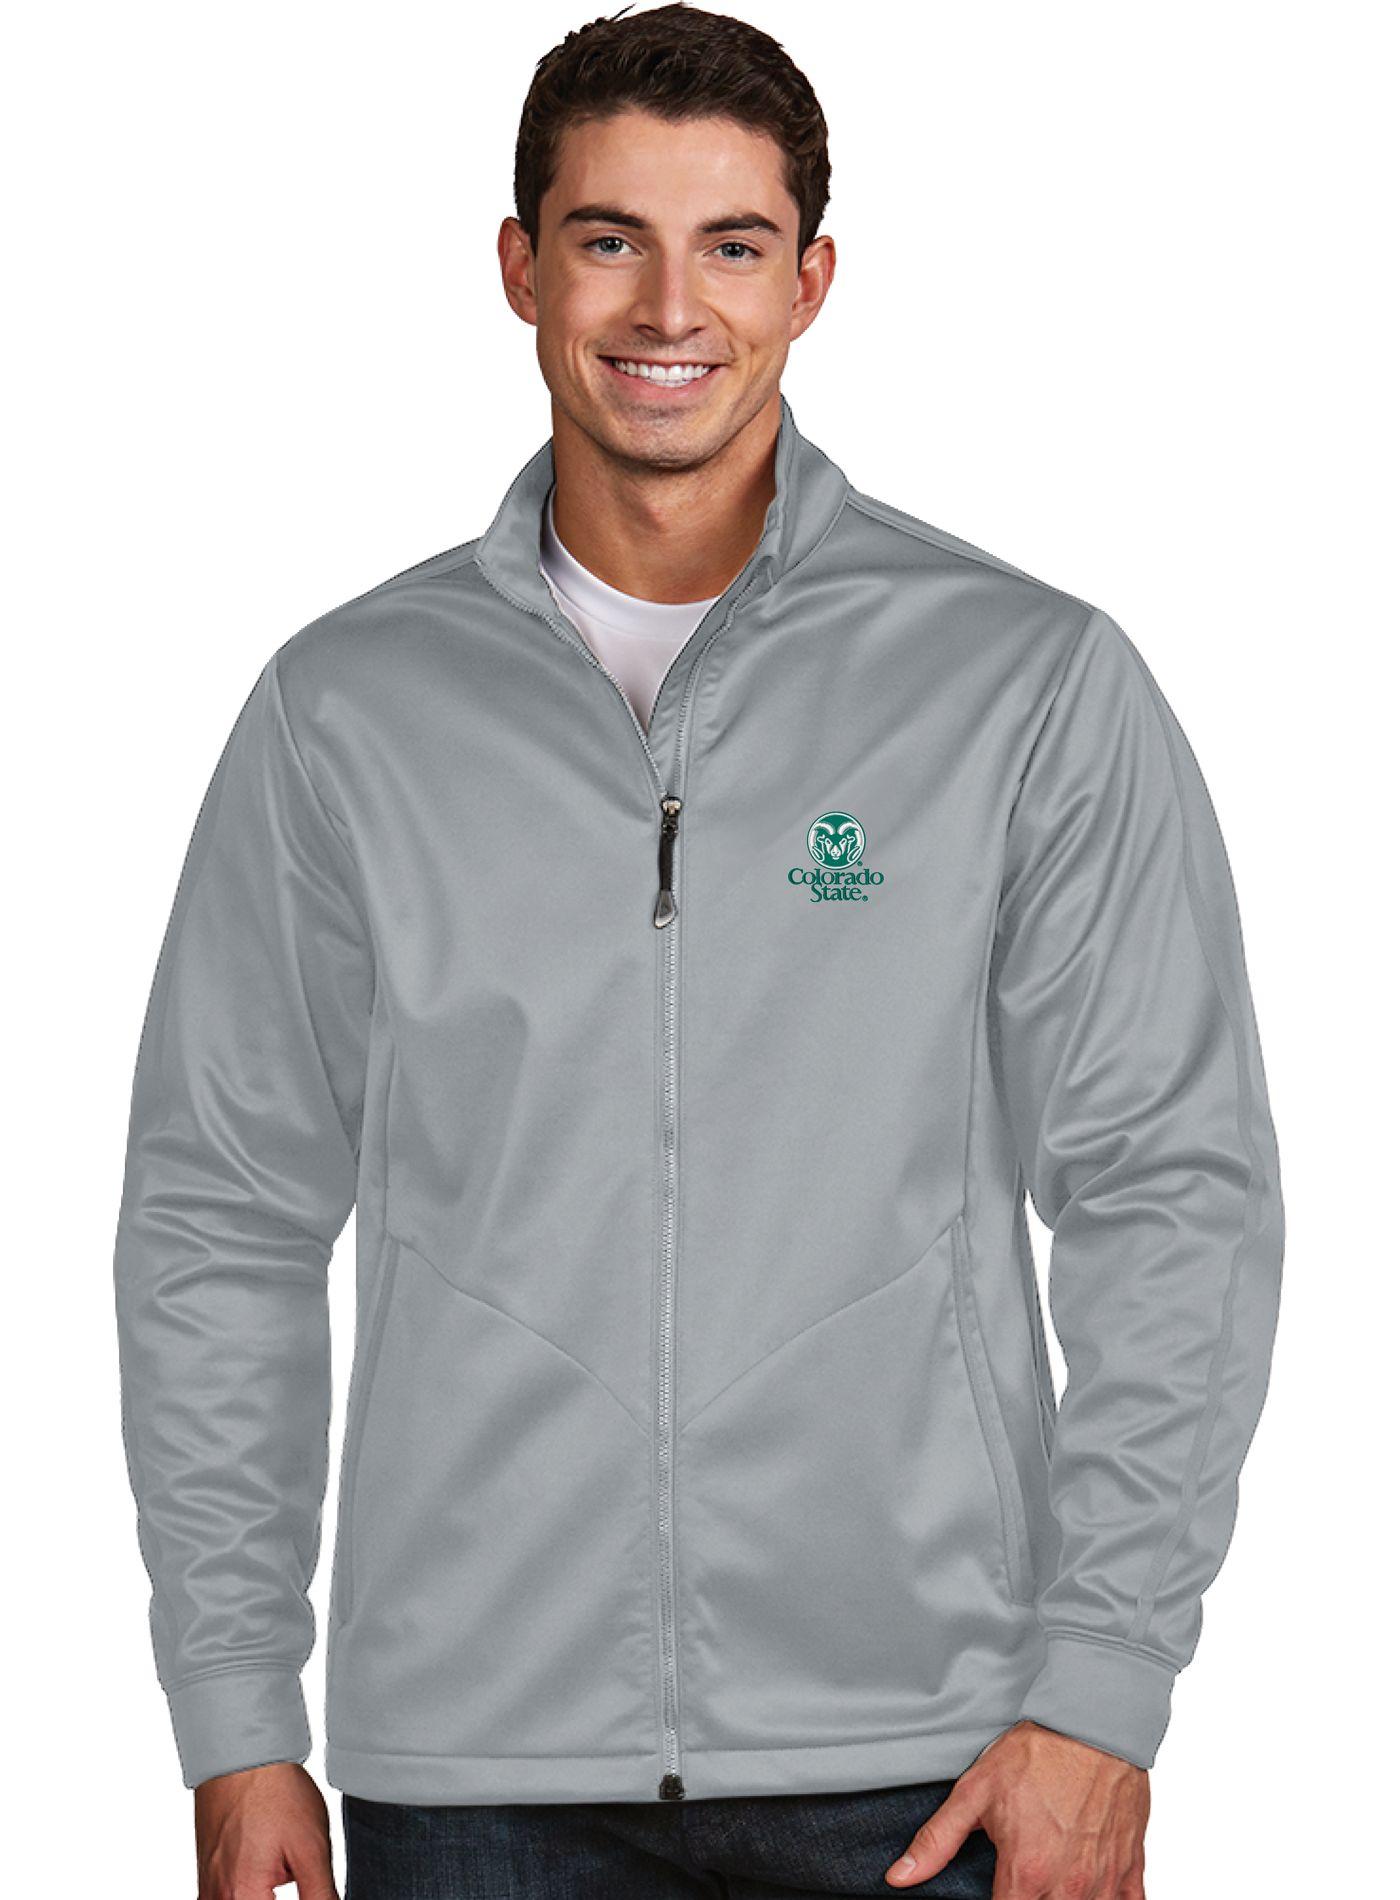 Antigua Men's Colorado State Rams Silver Performance Golf Jacket